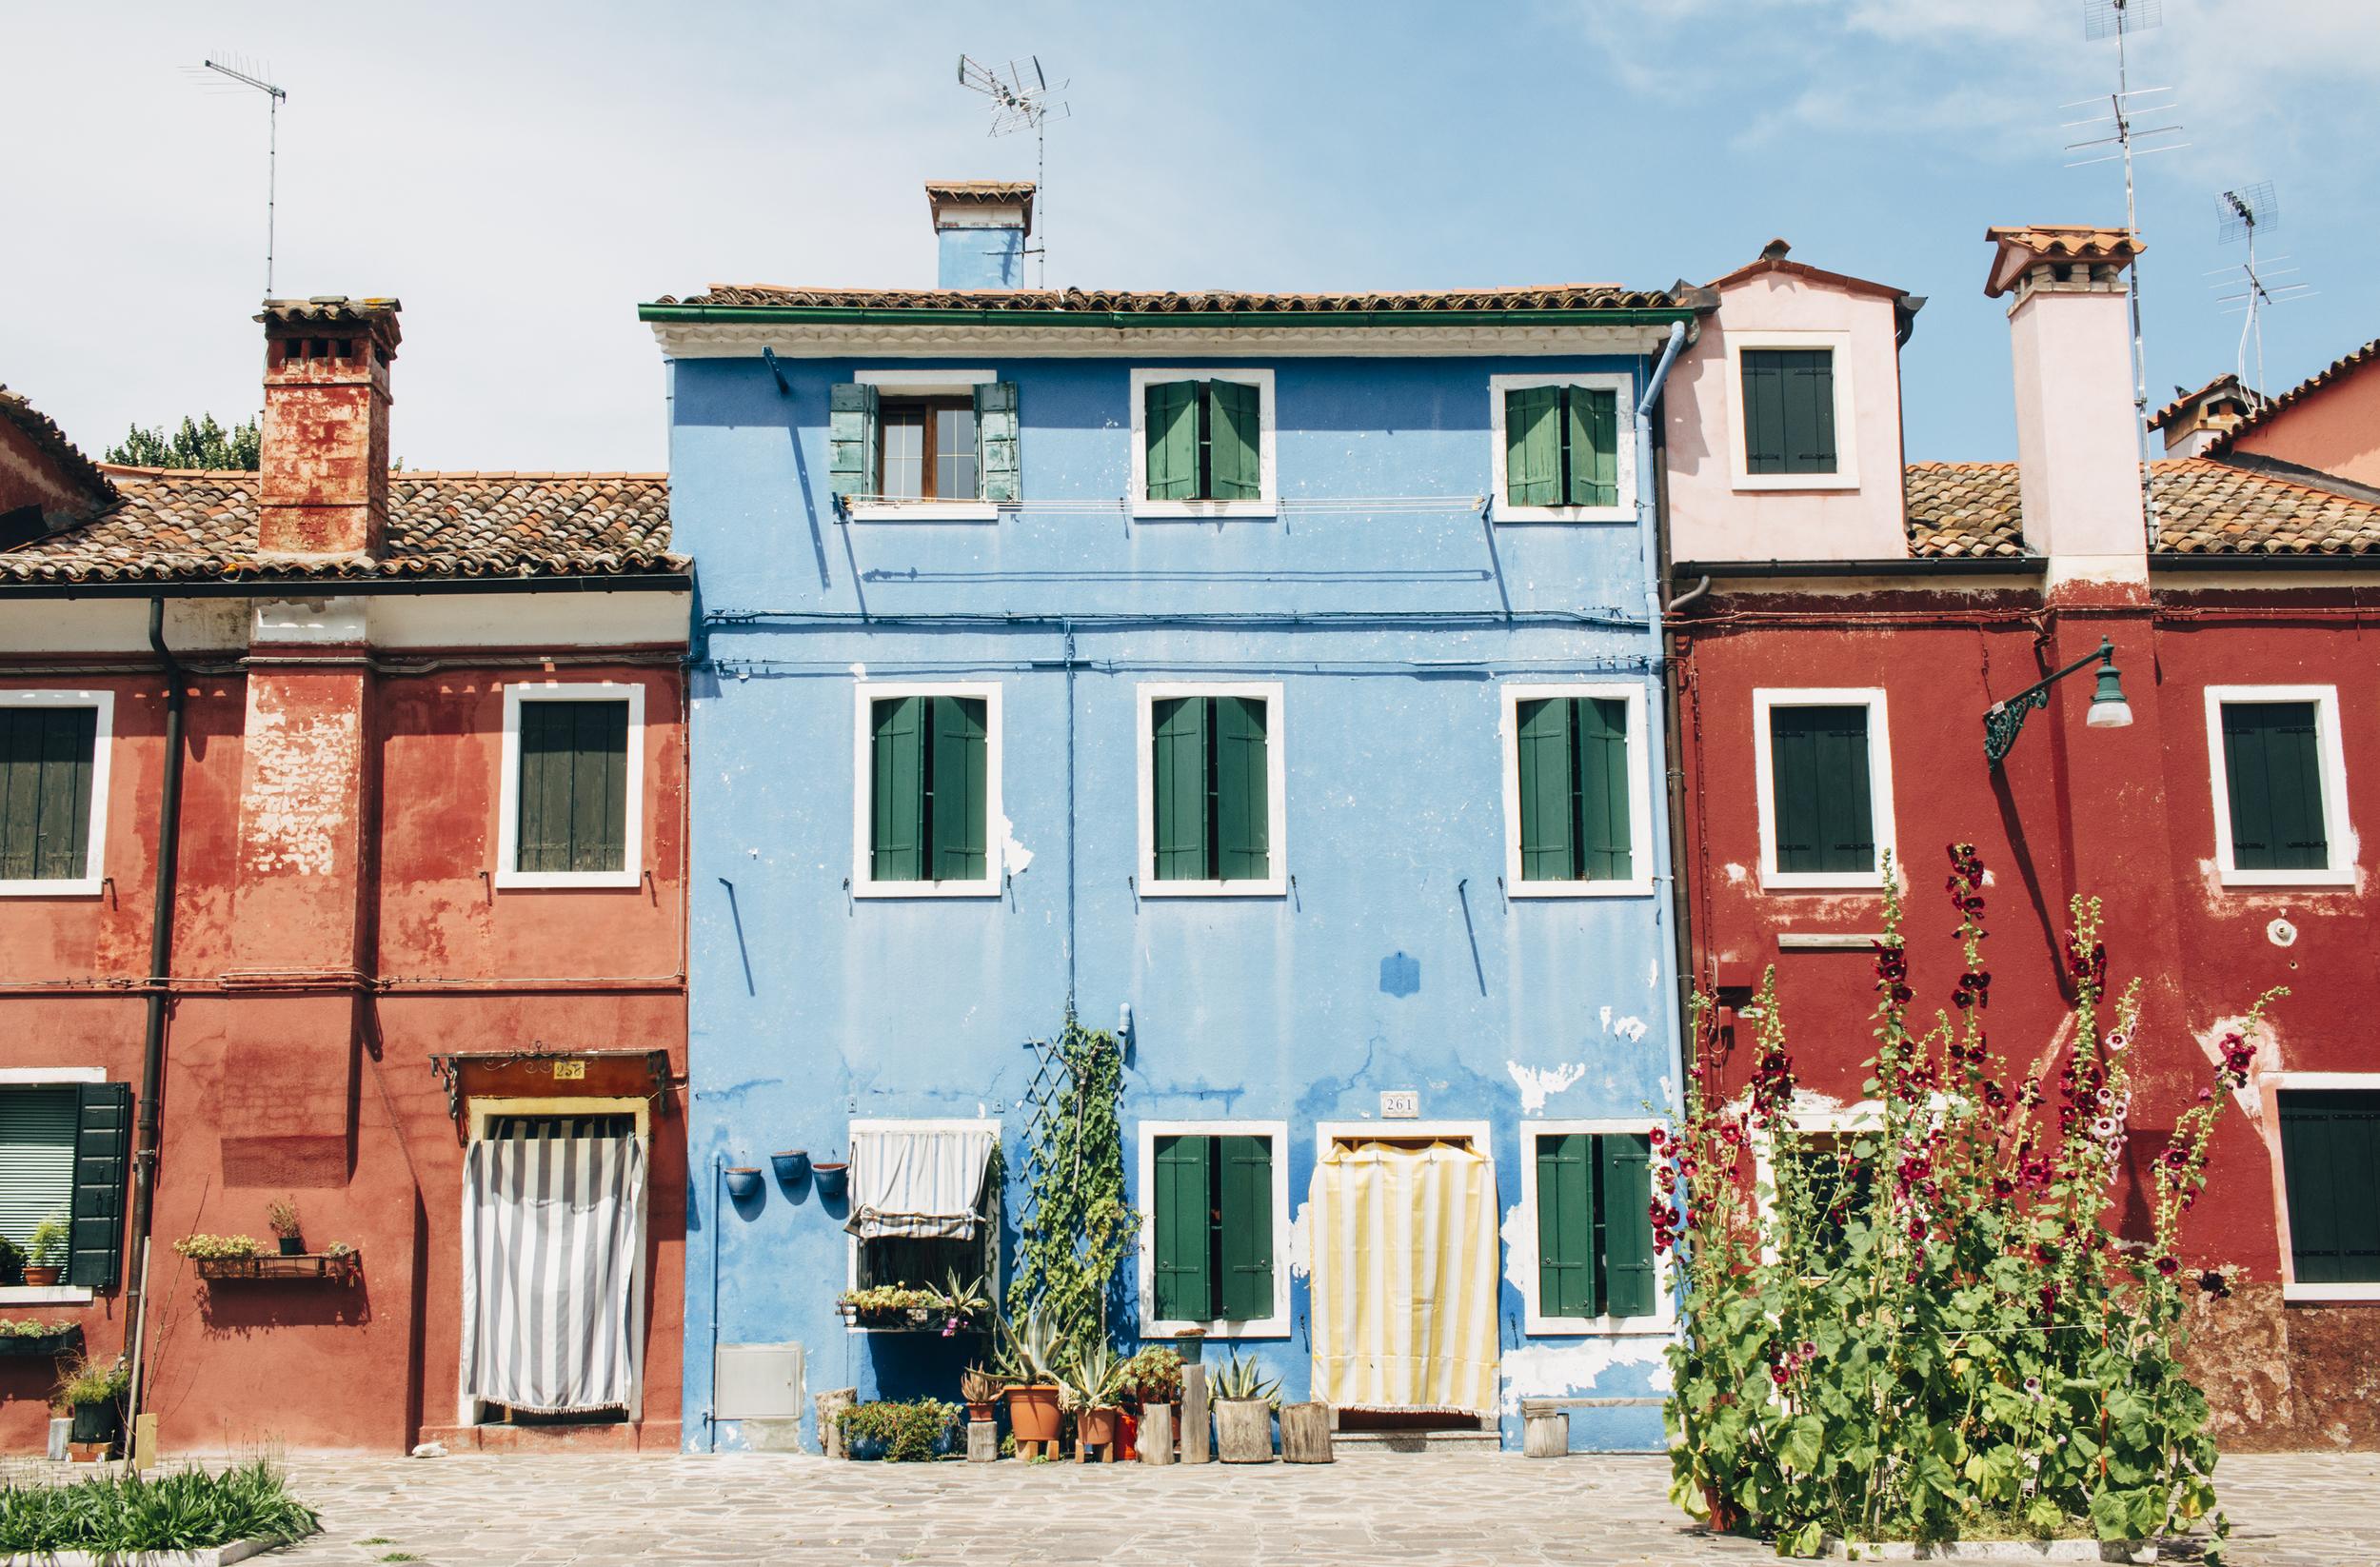 Venice_06032016_363.jpg